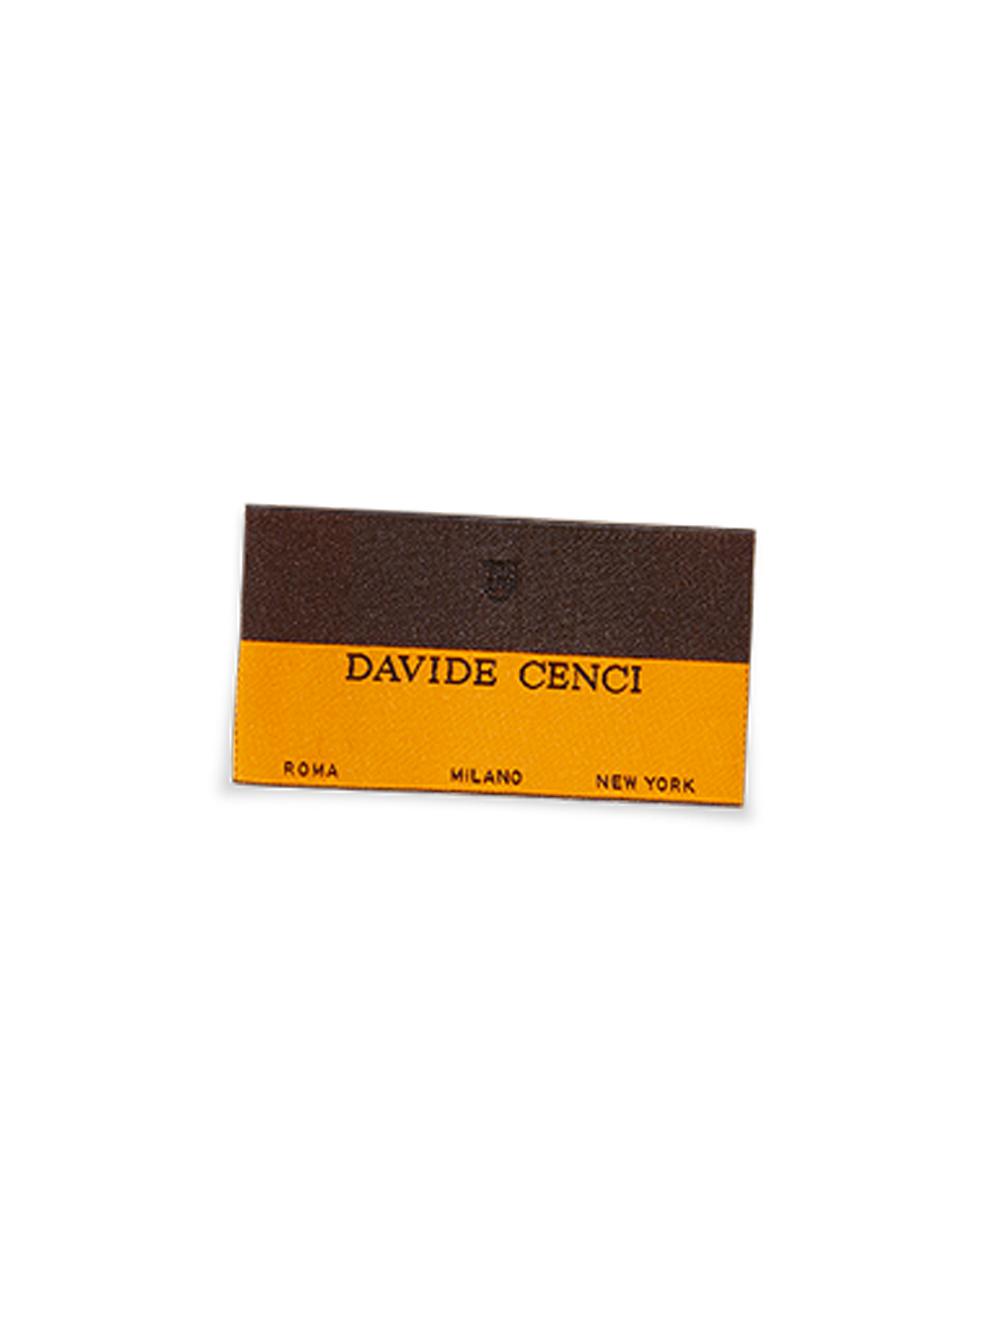 Dove-grey cashmere turtleneck